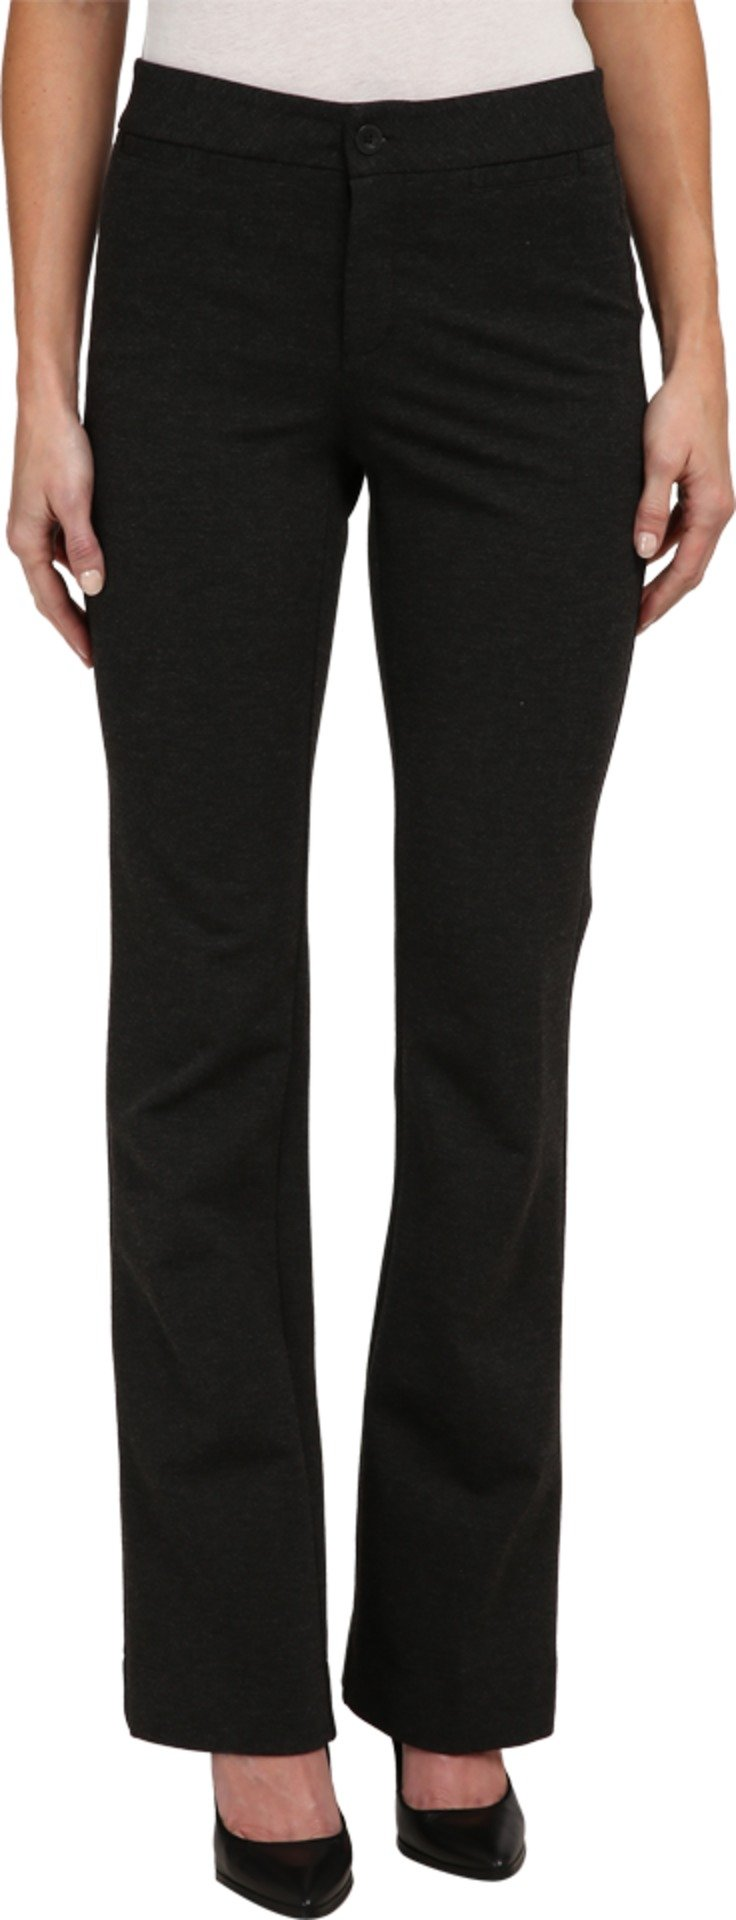 NYDJ Women's Michelle Ponte Trouser Charcoal Pants